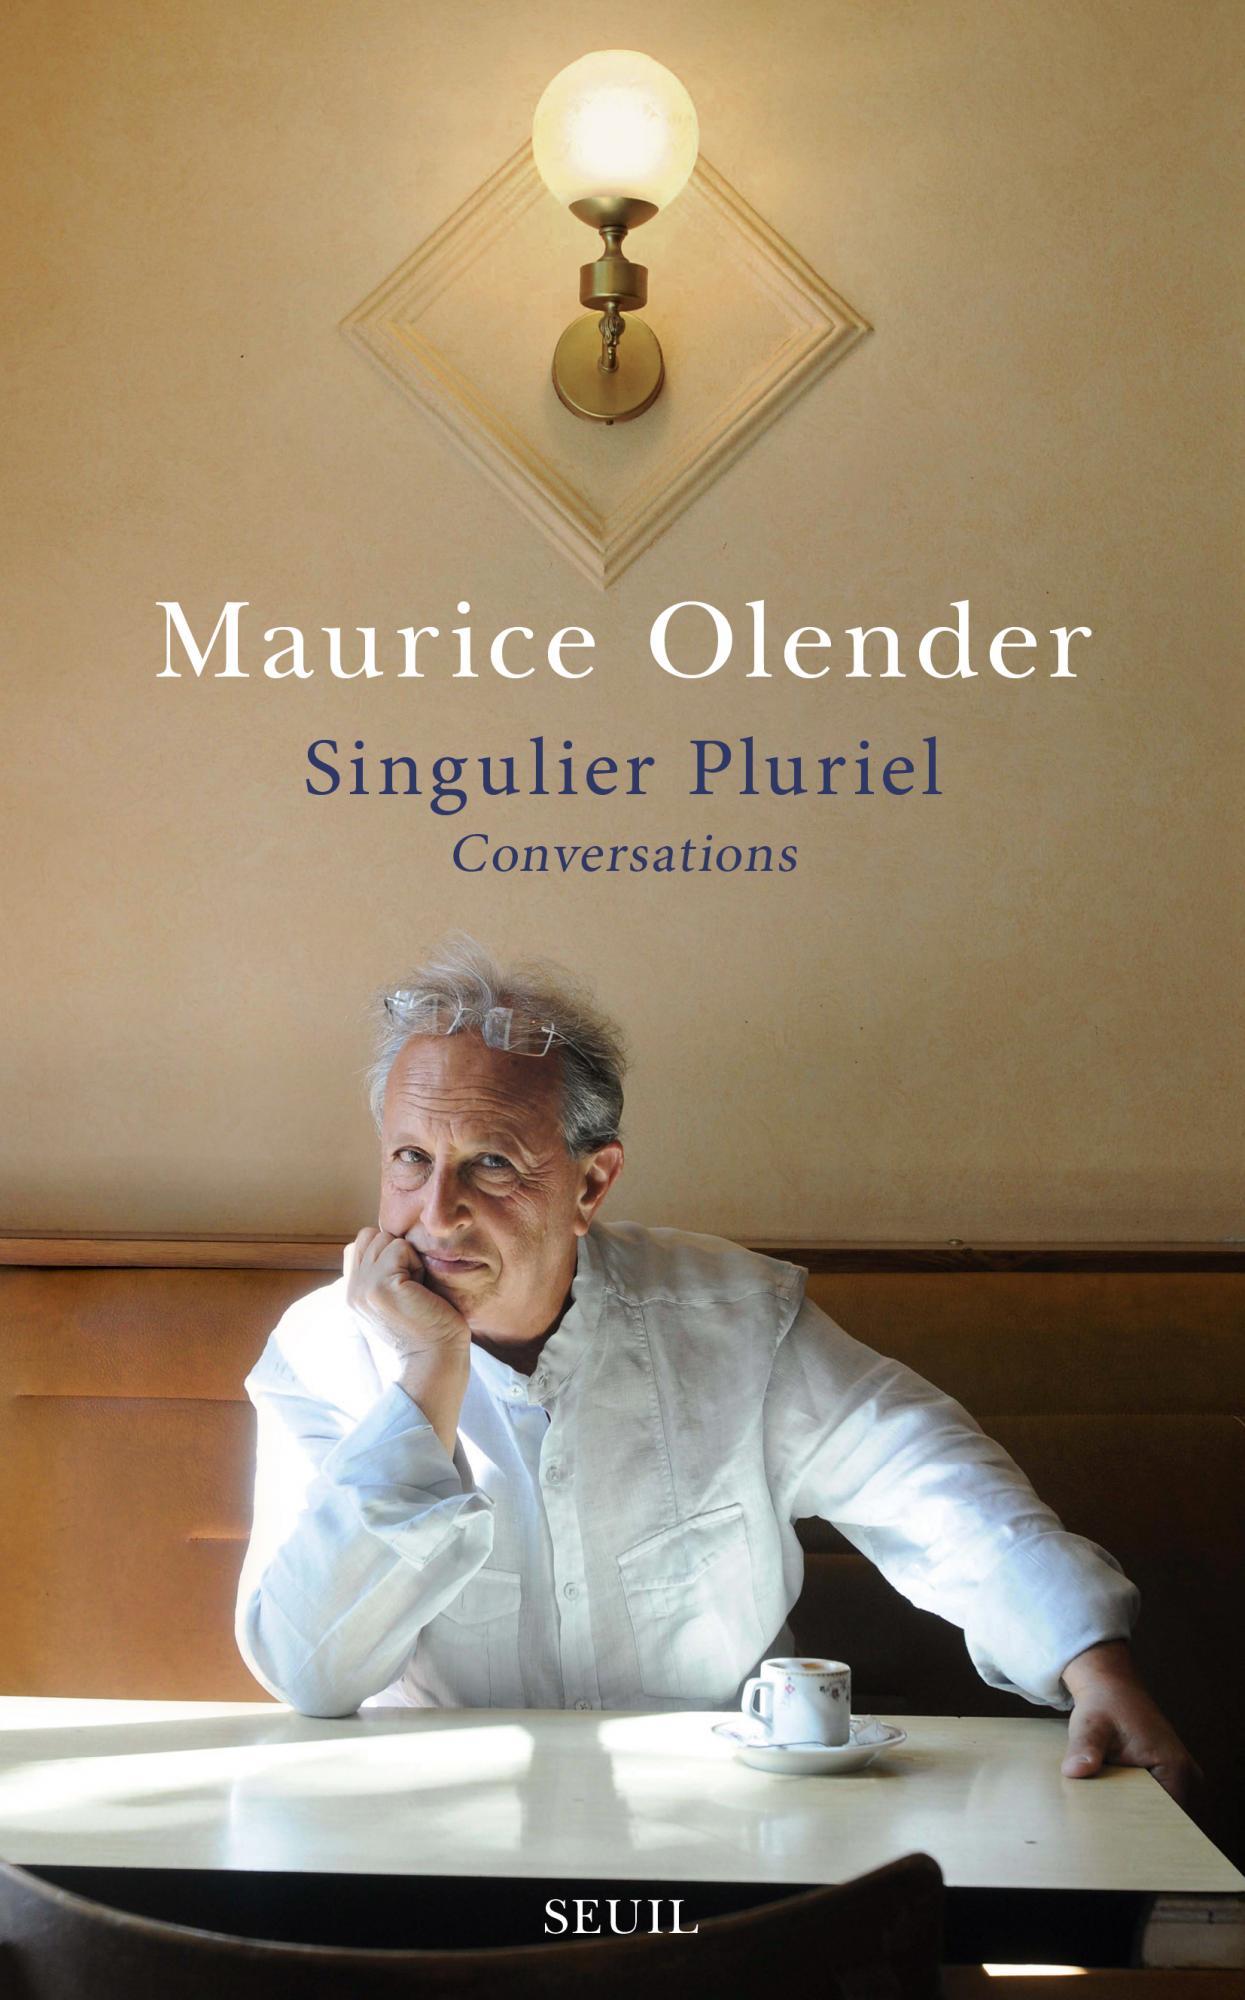 M. Olender, Singulier pluriel